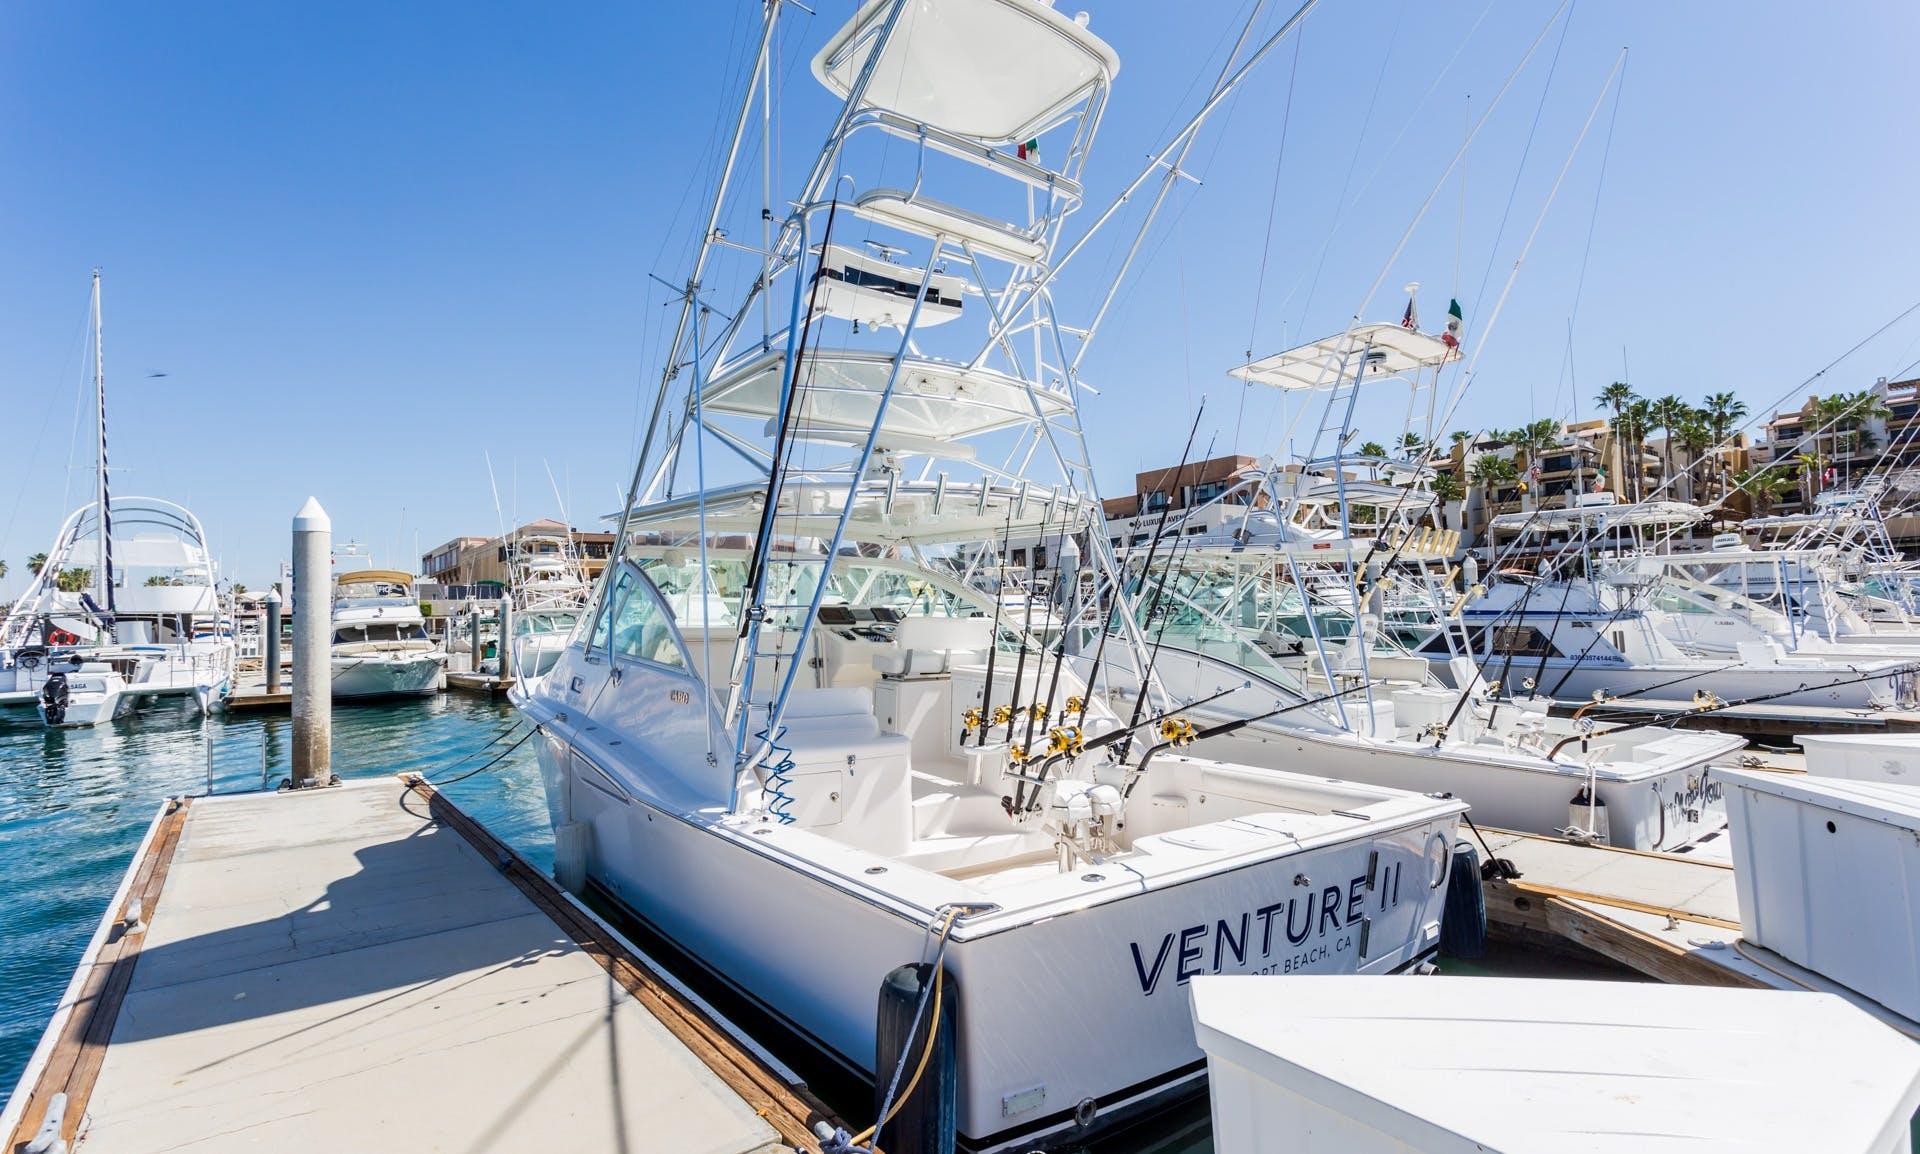 Fishing charter avaialble in Baja California Sur, Mexico aboard 35' Cabo Expreso Sport Fisherman